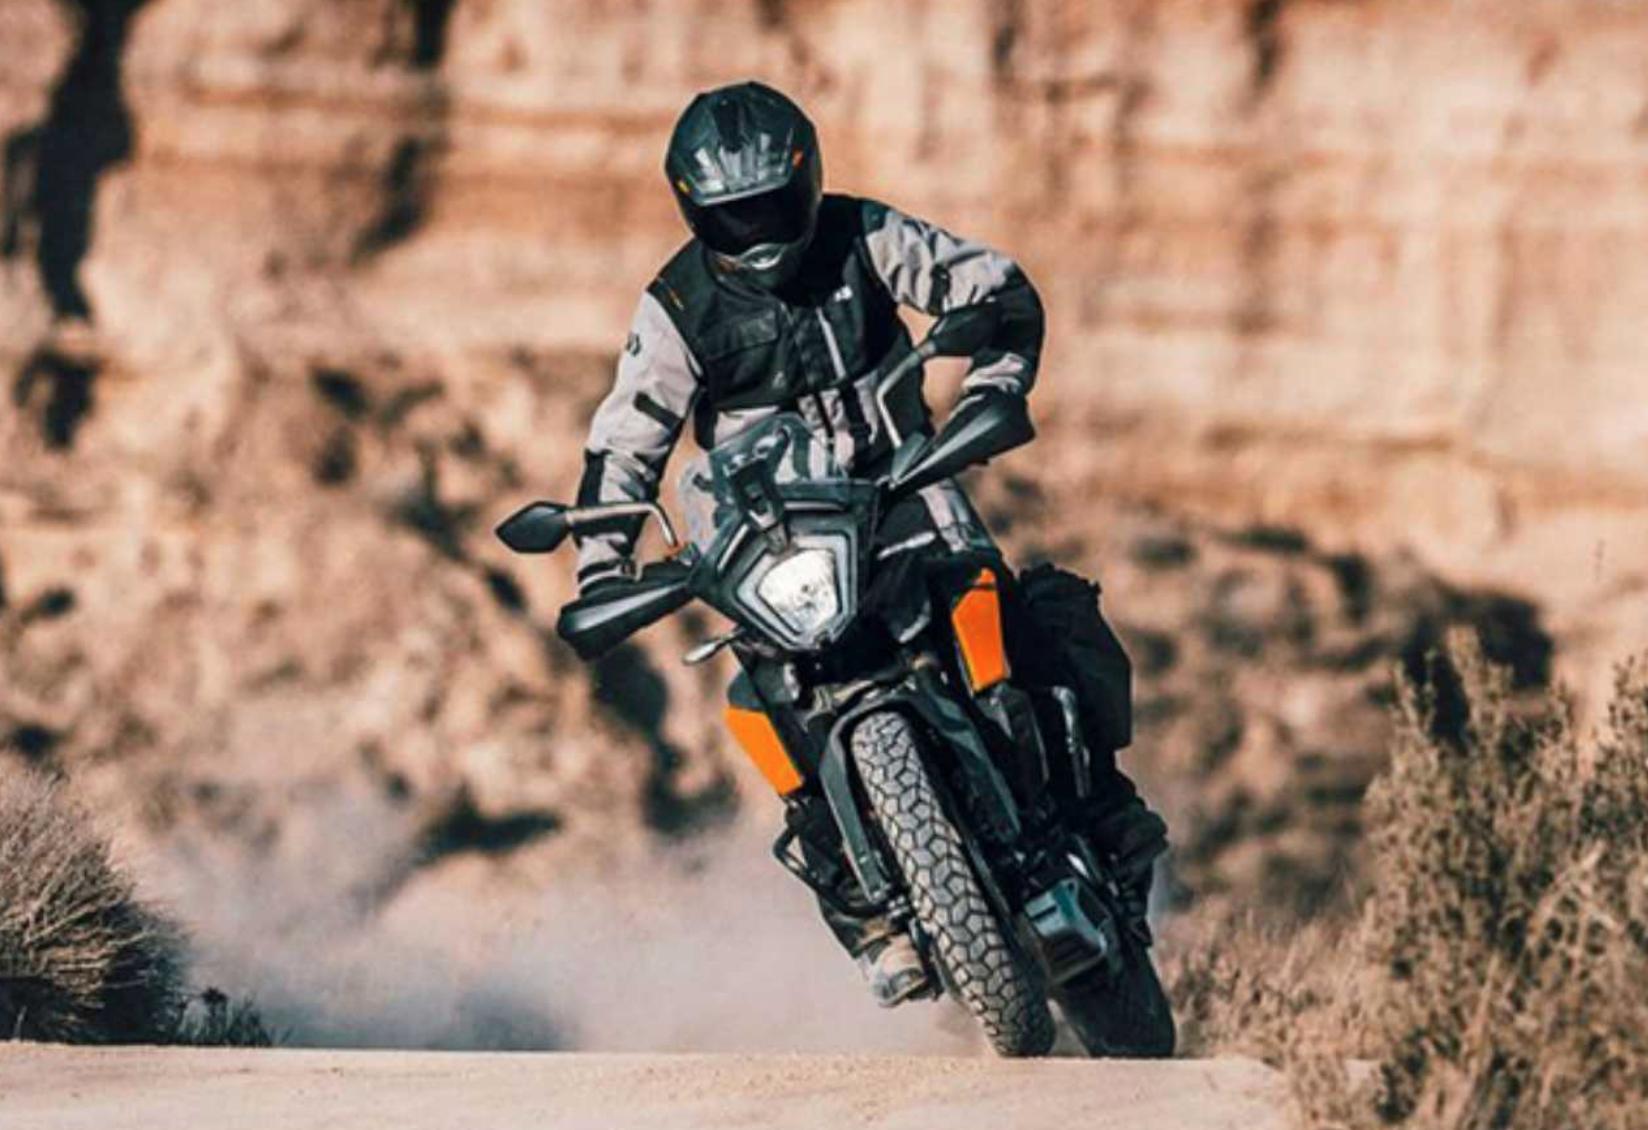 KTM 250 Adventure